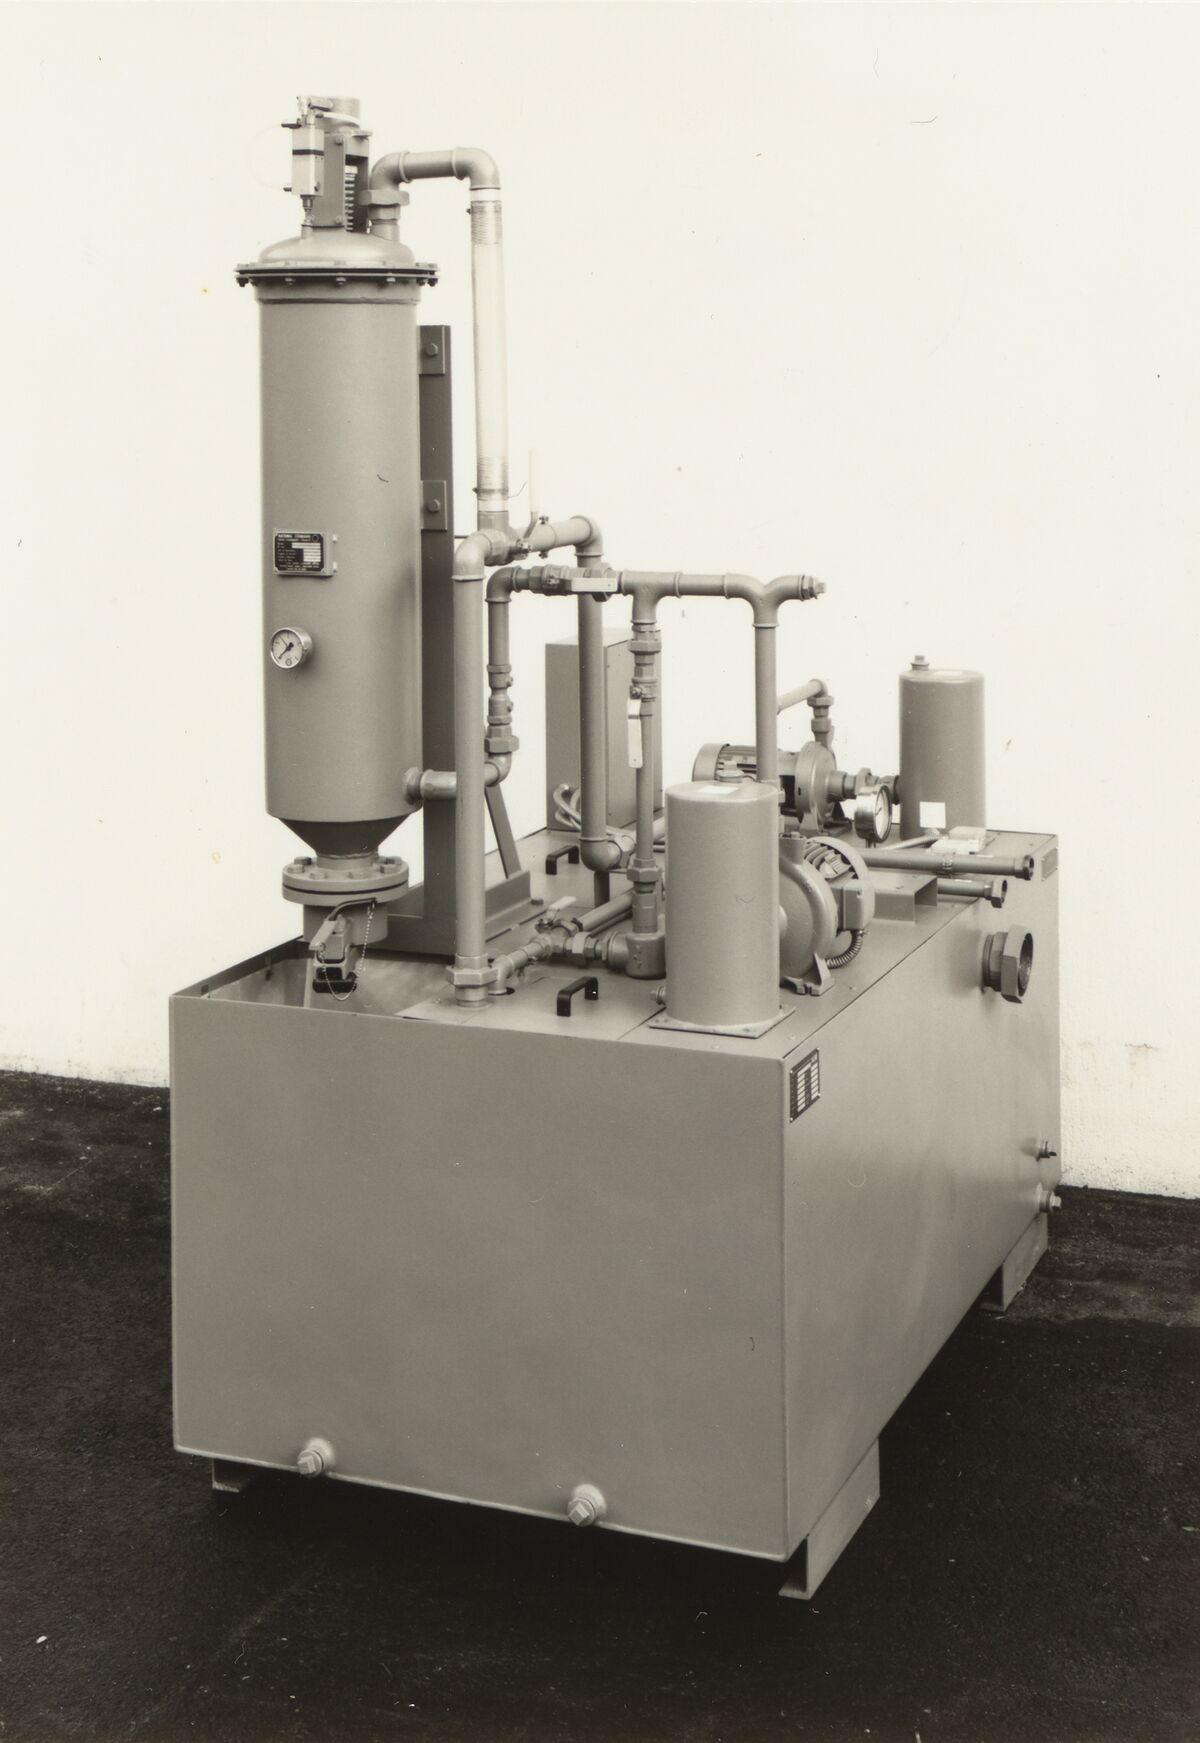 GFA 42/32025: Dielectric unit DAE-600